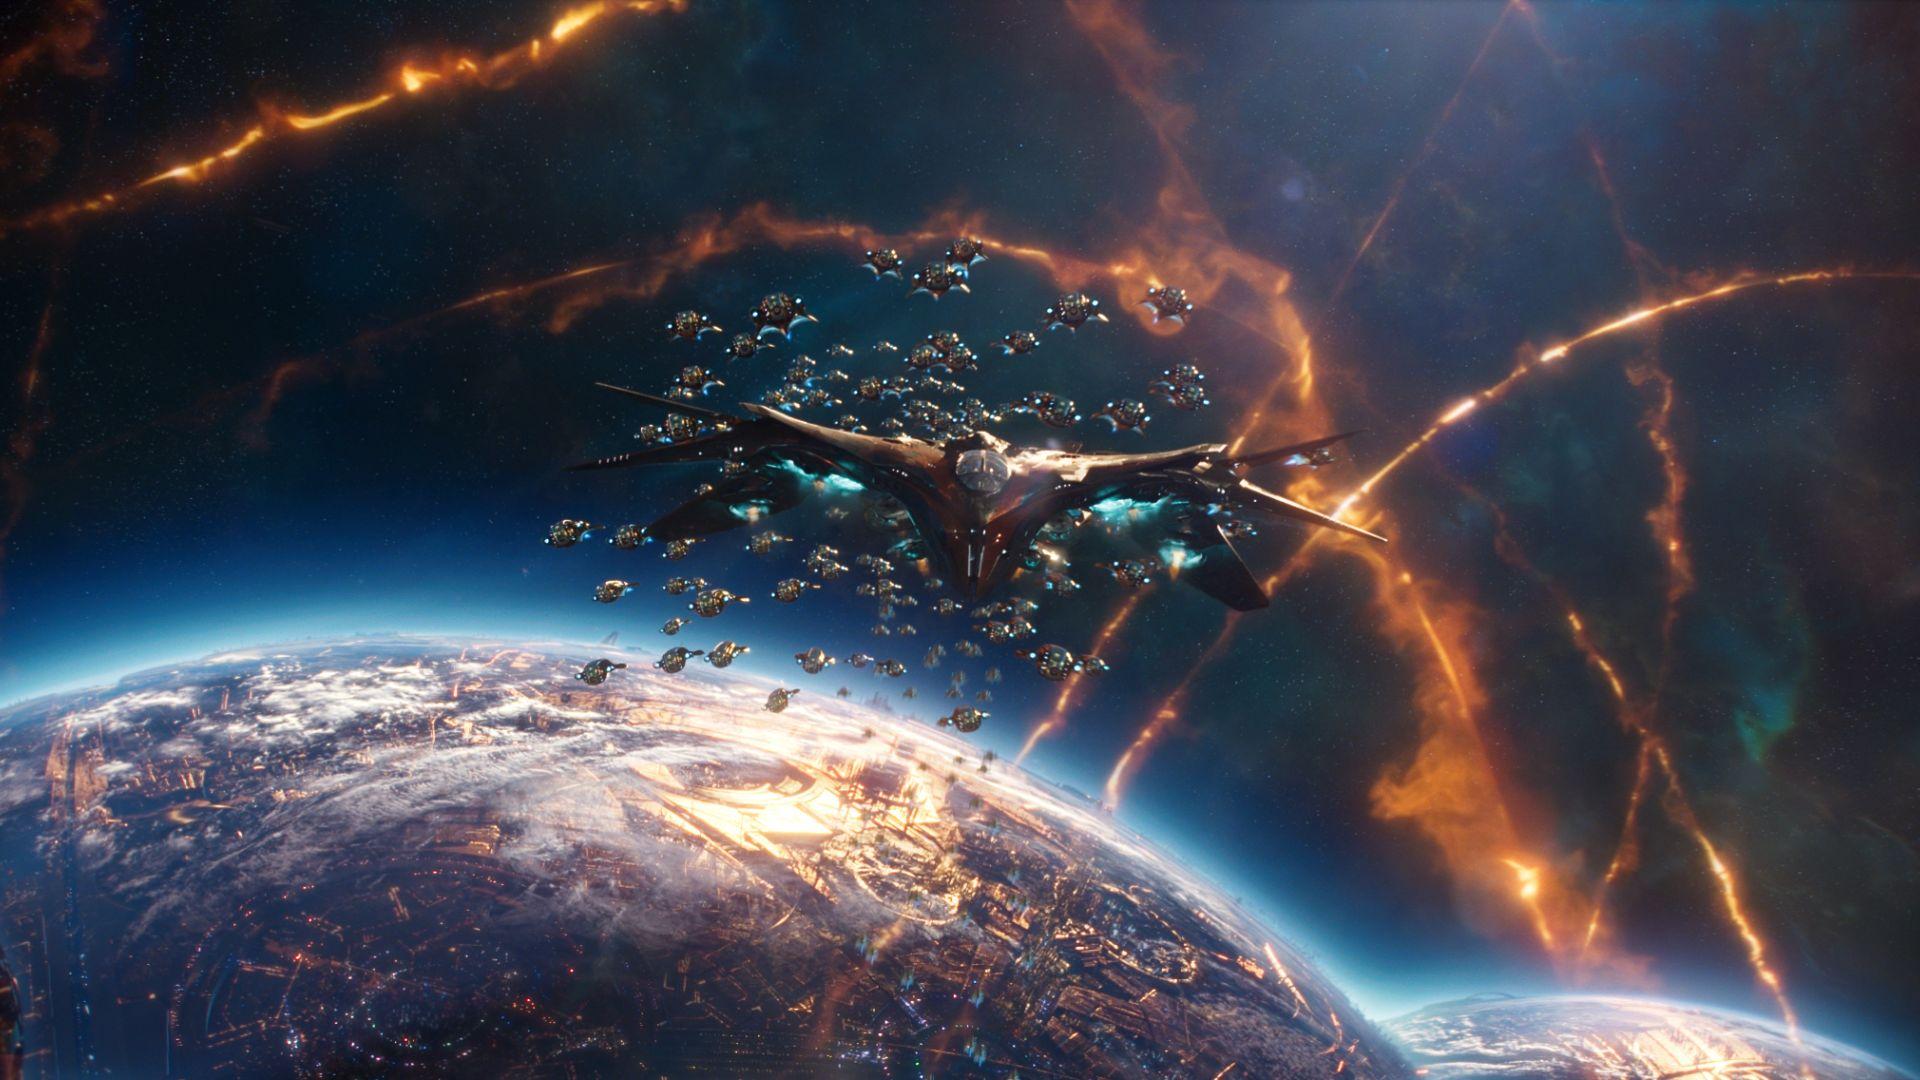 Desktop Wallpaper Guardians Of The Galaxy Vol 2 Movie Spaceship 1920x1080